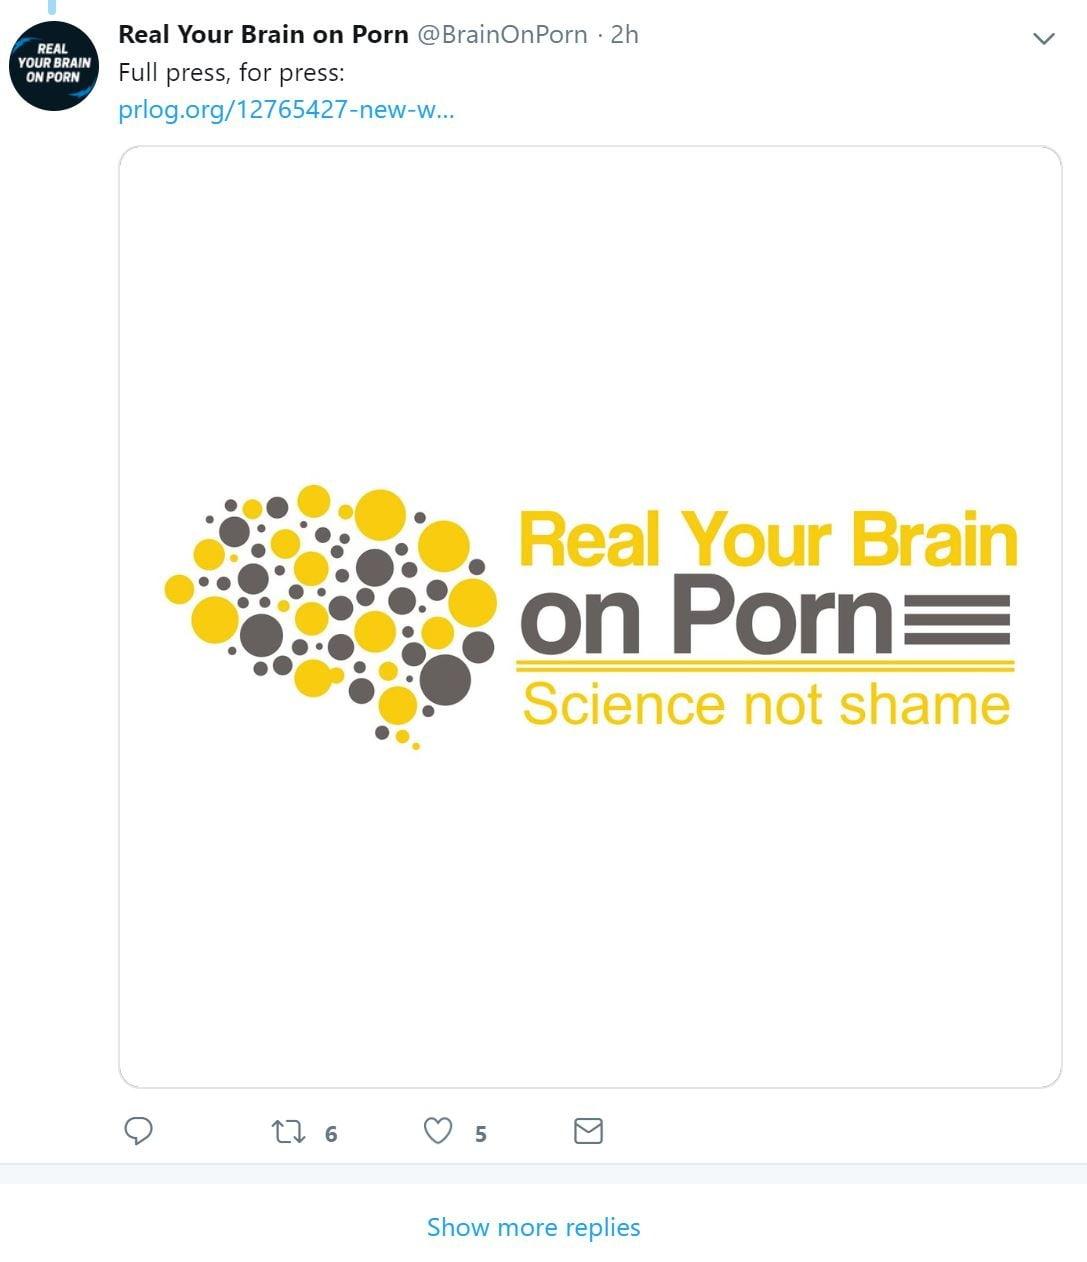 Daniel A Burgess LMFT owns realyourbrainonporn.com